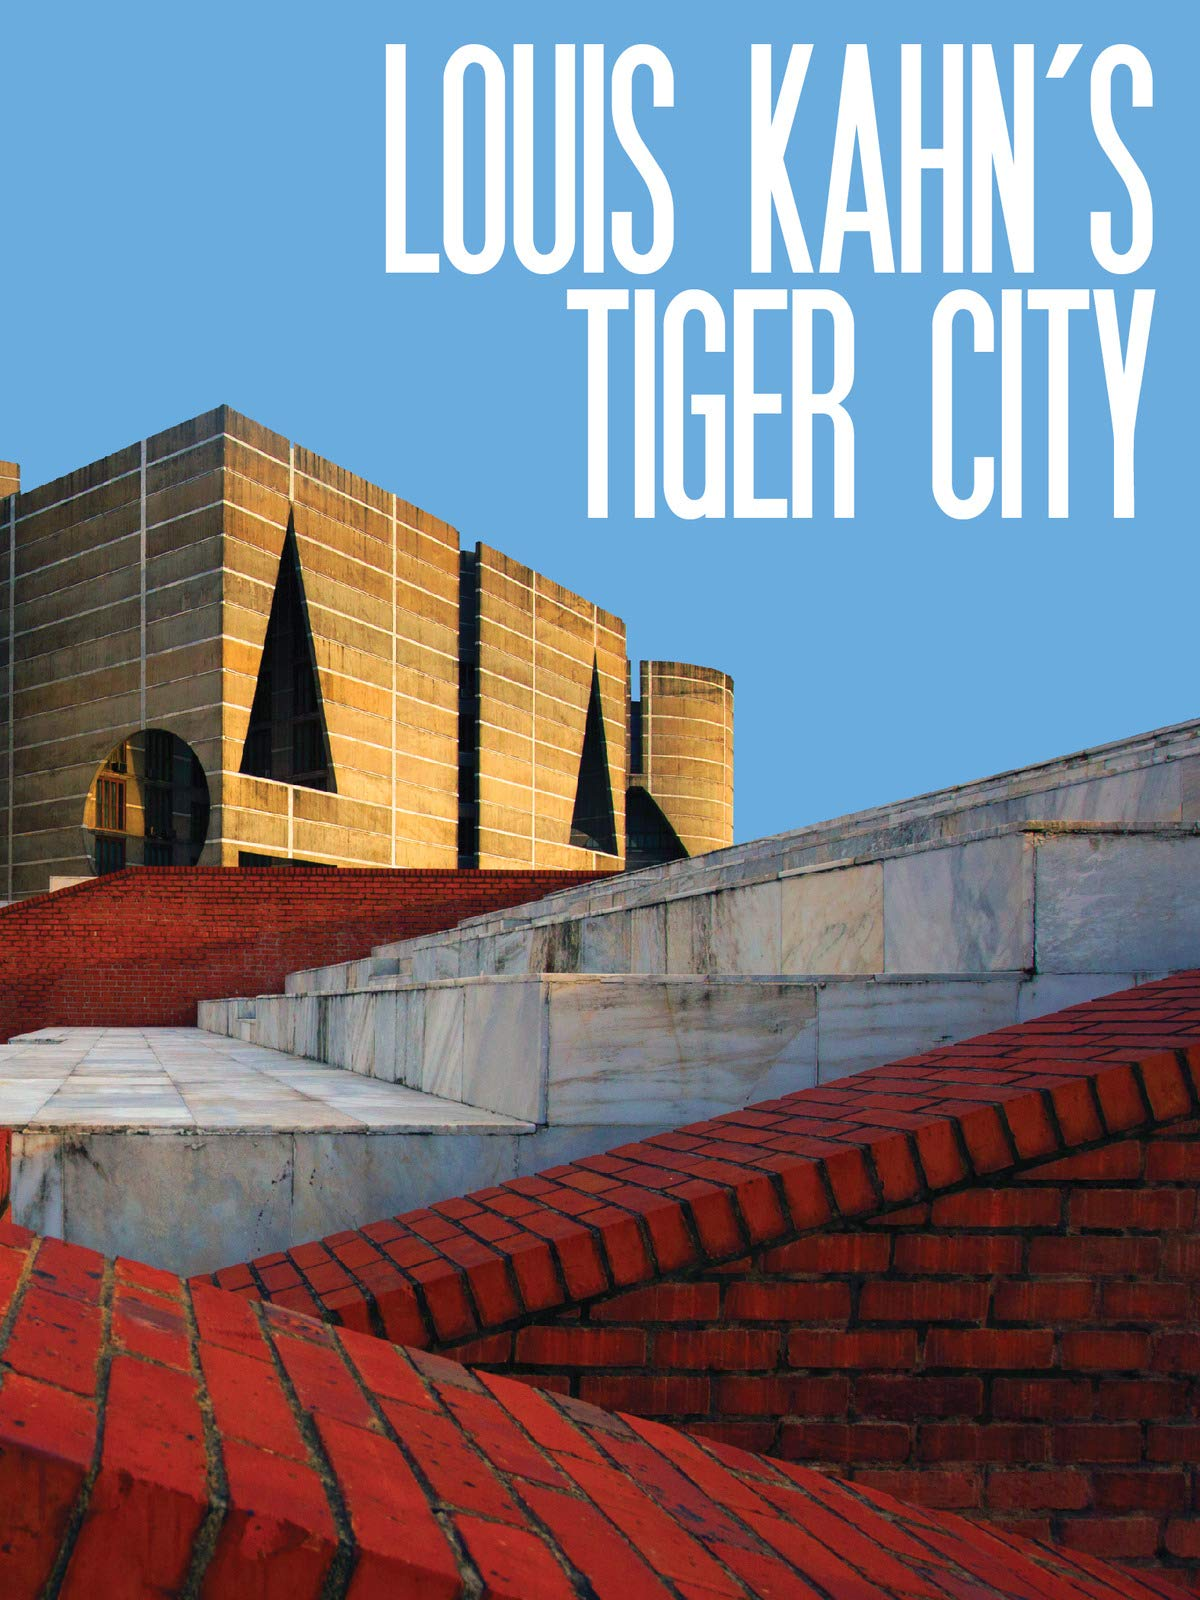 Louis Kahn's Tiger City on Amazon Prime Video UK